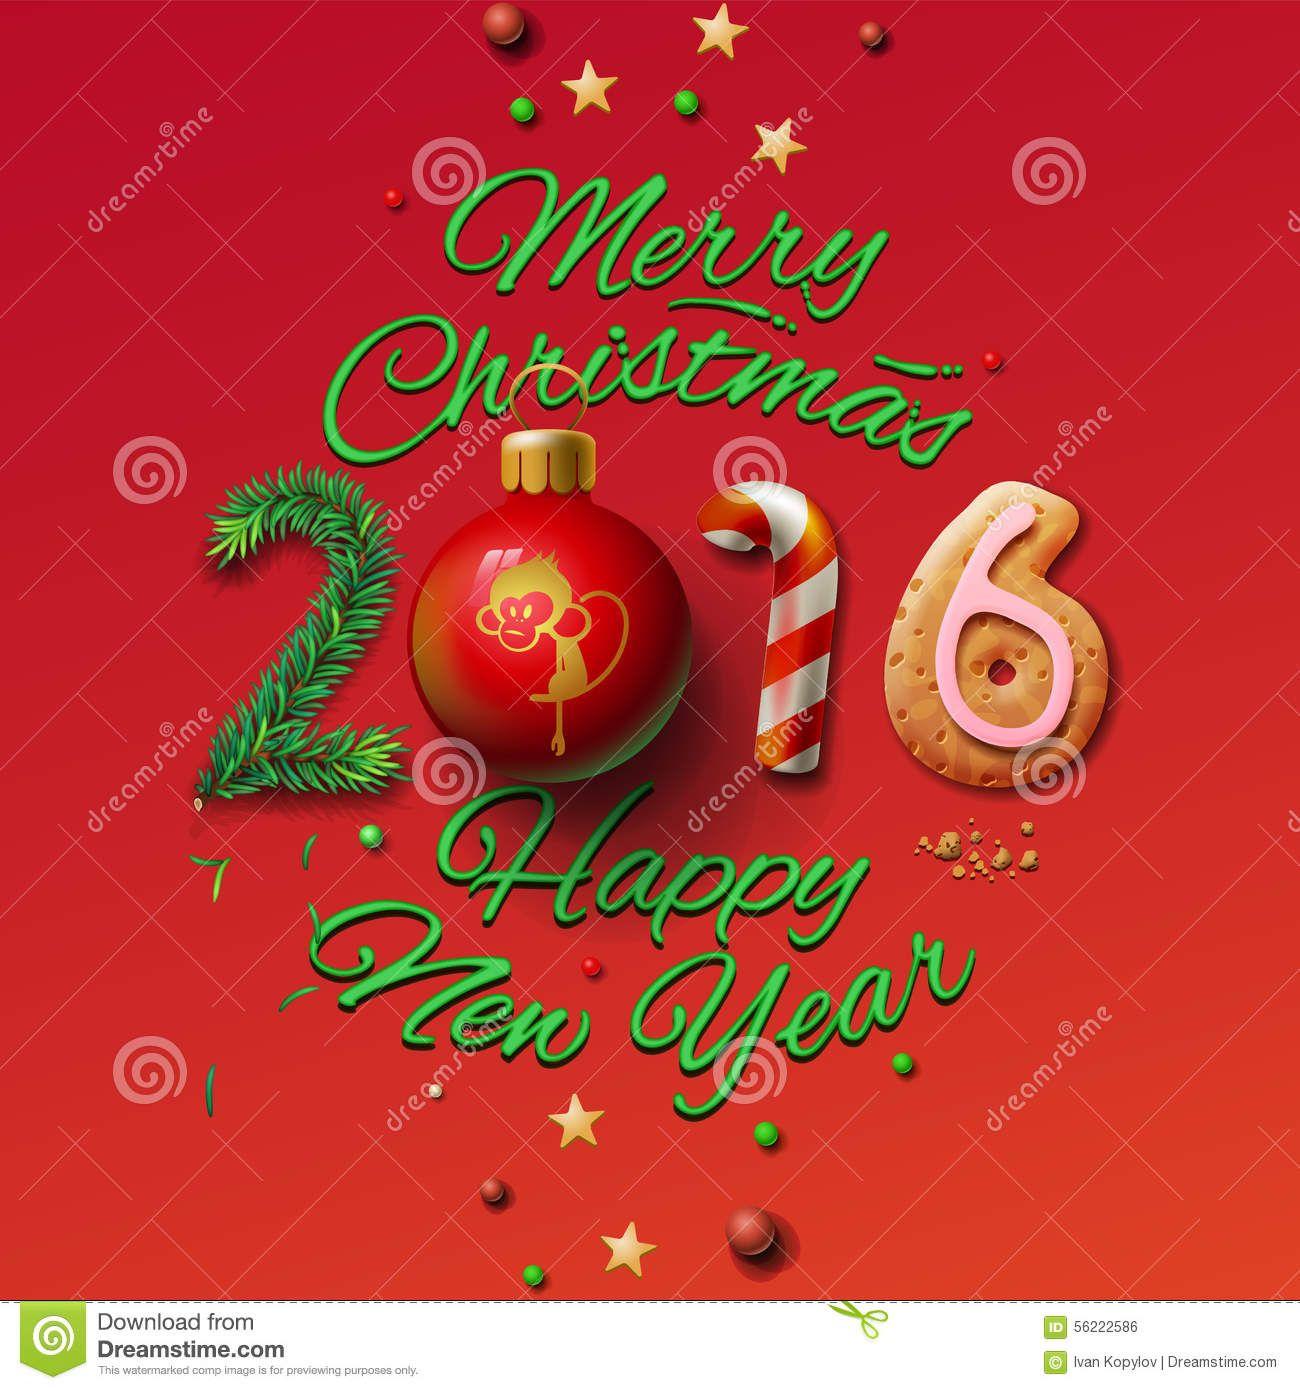 Noel resimleri happy new year googleda ara yeni yl pinterest noel resimleri happy new year googleda ara m4hsunfo